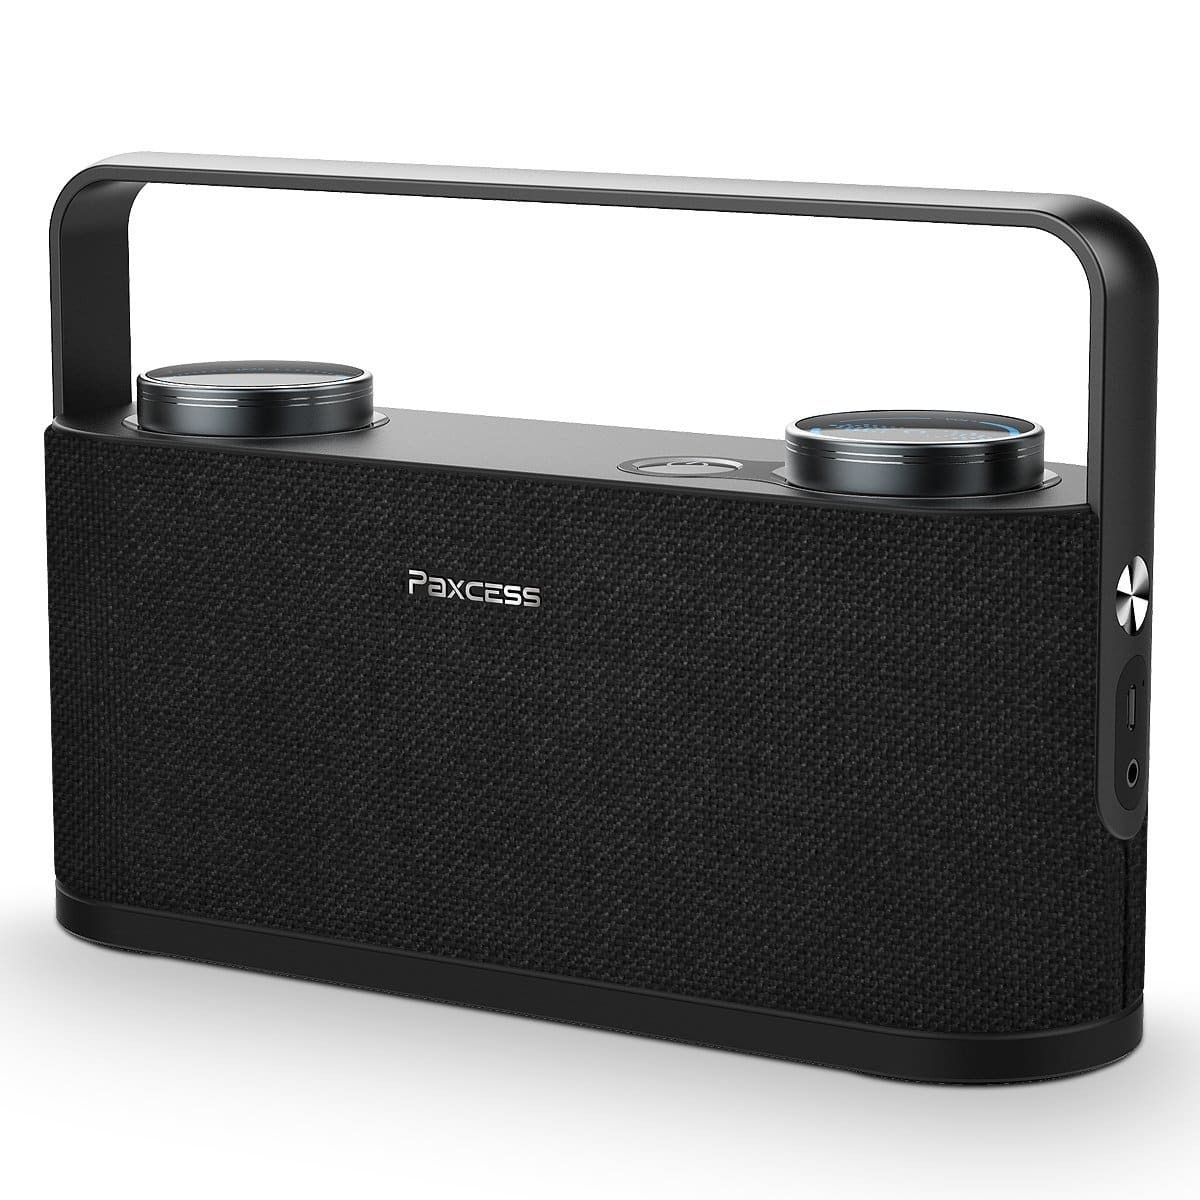 PAXCESS Wireless Bluetooth Morgen Portable Speaker 20W Driver - $20